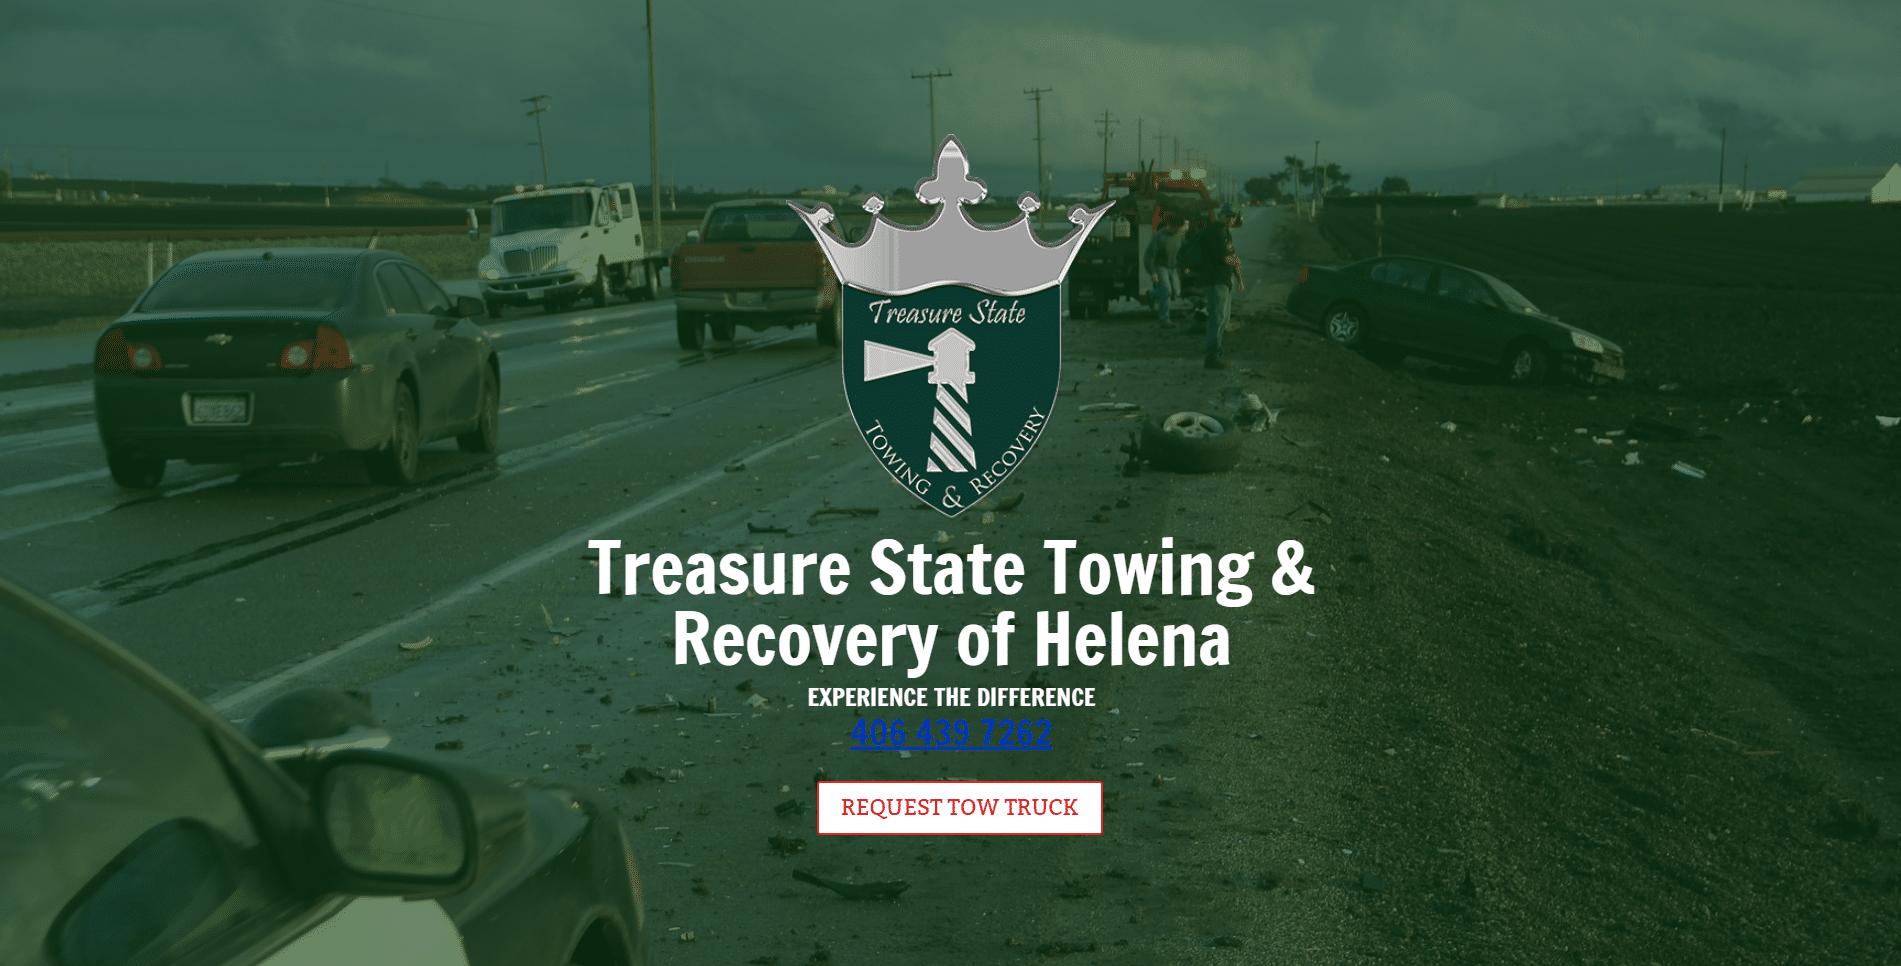 http://treasurestatetowingandrecovery.com